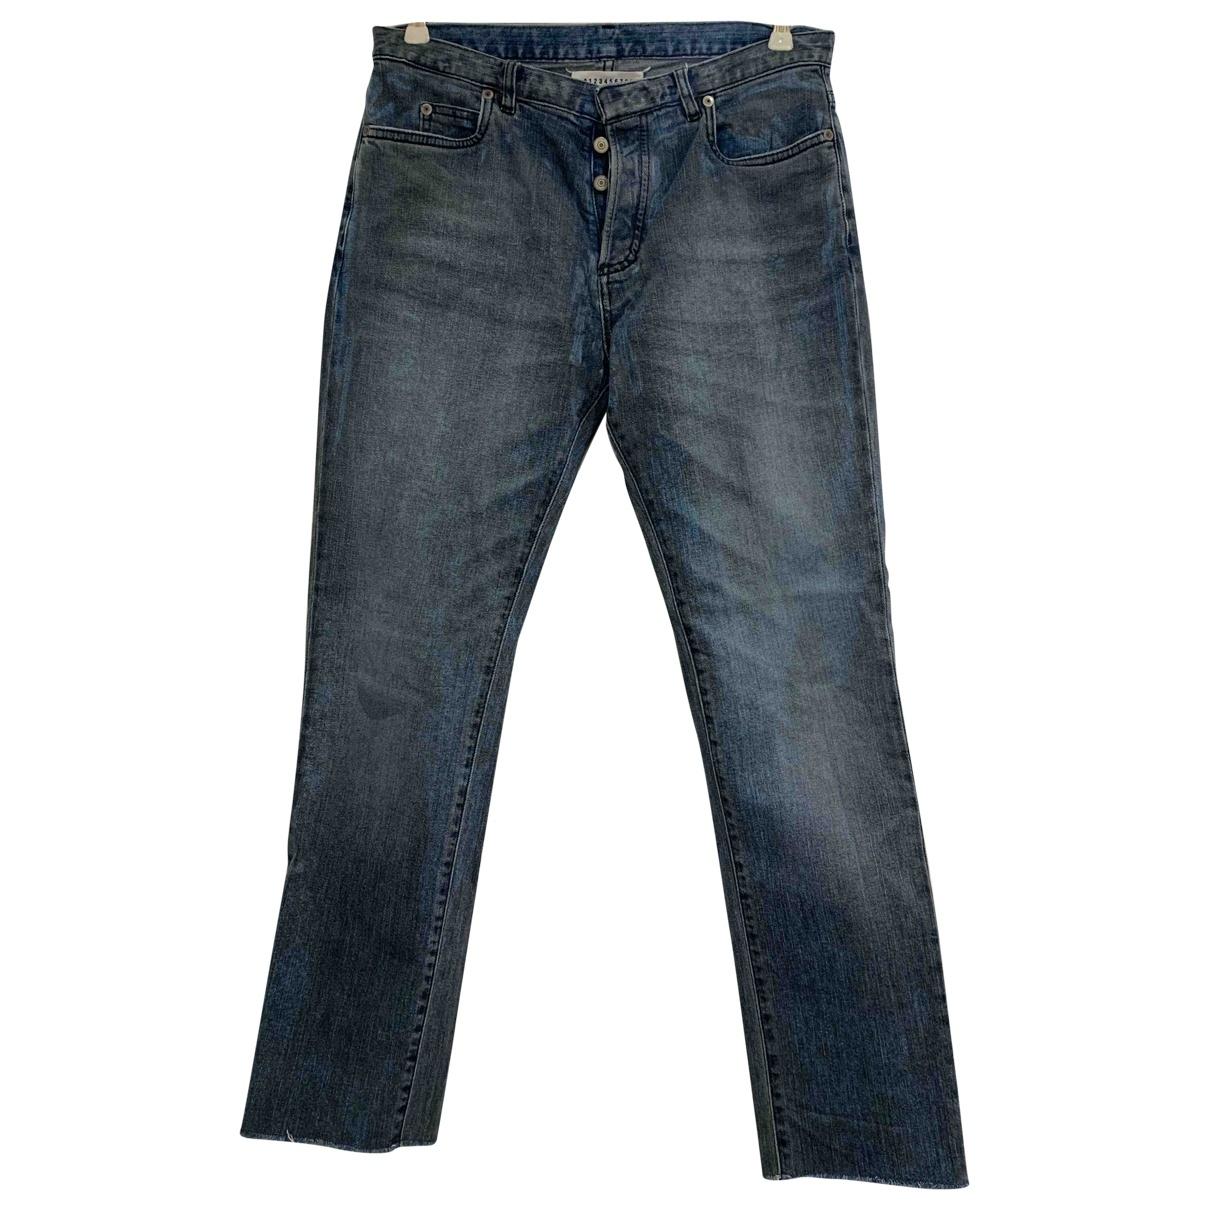 Maison Martin Margiela \N Blue Cotton - elasthane Jeans for Men 30 US